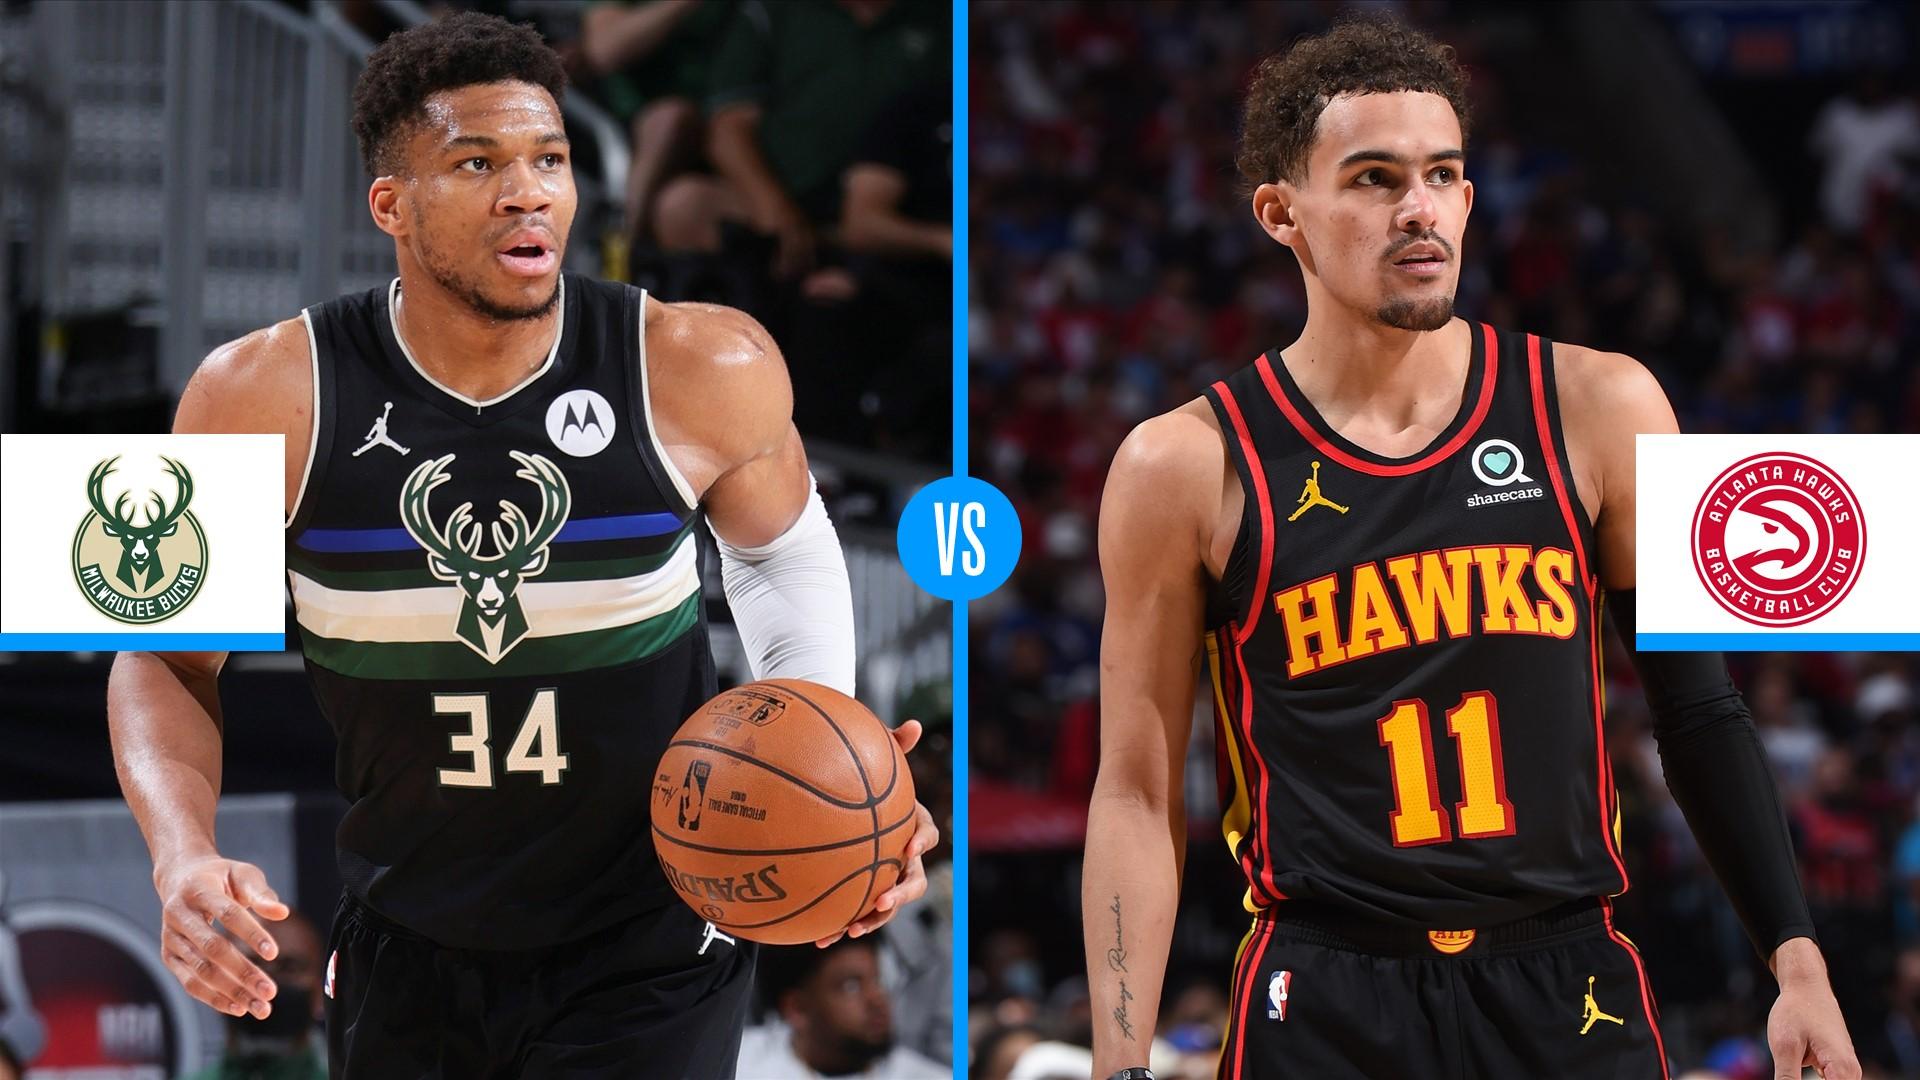 Hawks vs Bucks Series Predictions